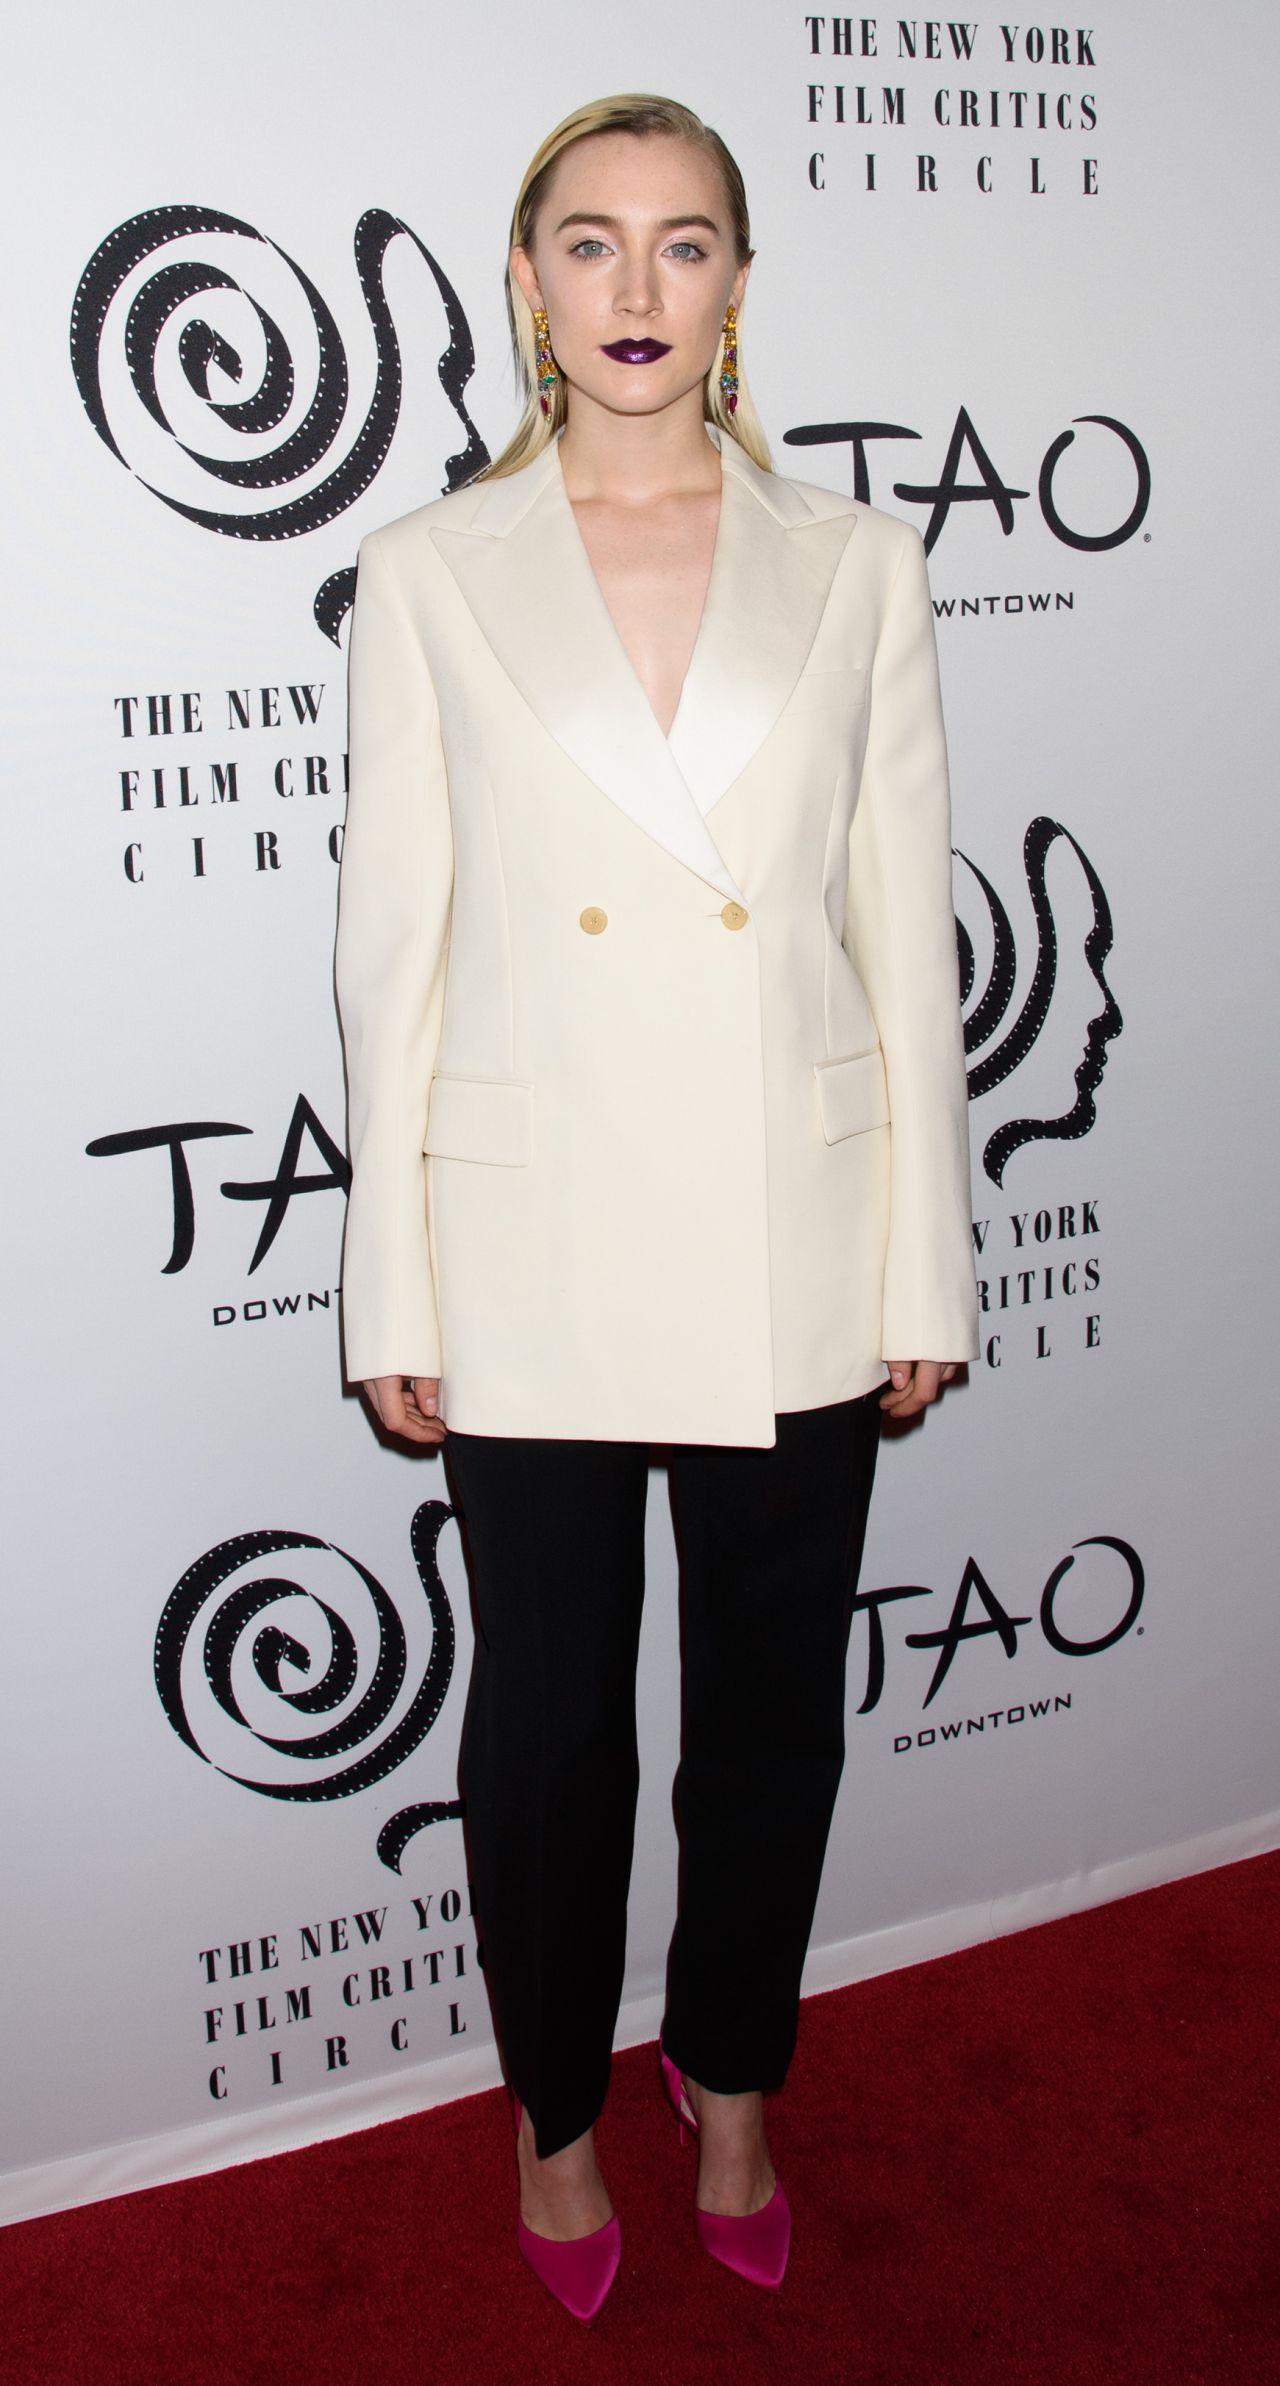 http://celebmafia.com/wp-content/uploads/2018/01/saoirse-ronan-2017-new-york-film-critics-awards-in-nyc-11.jpg